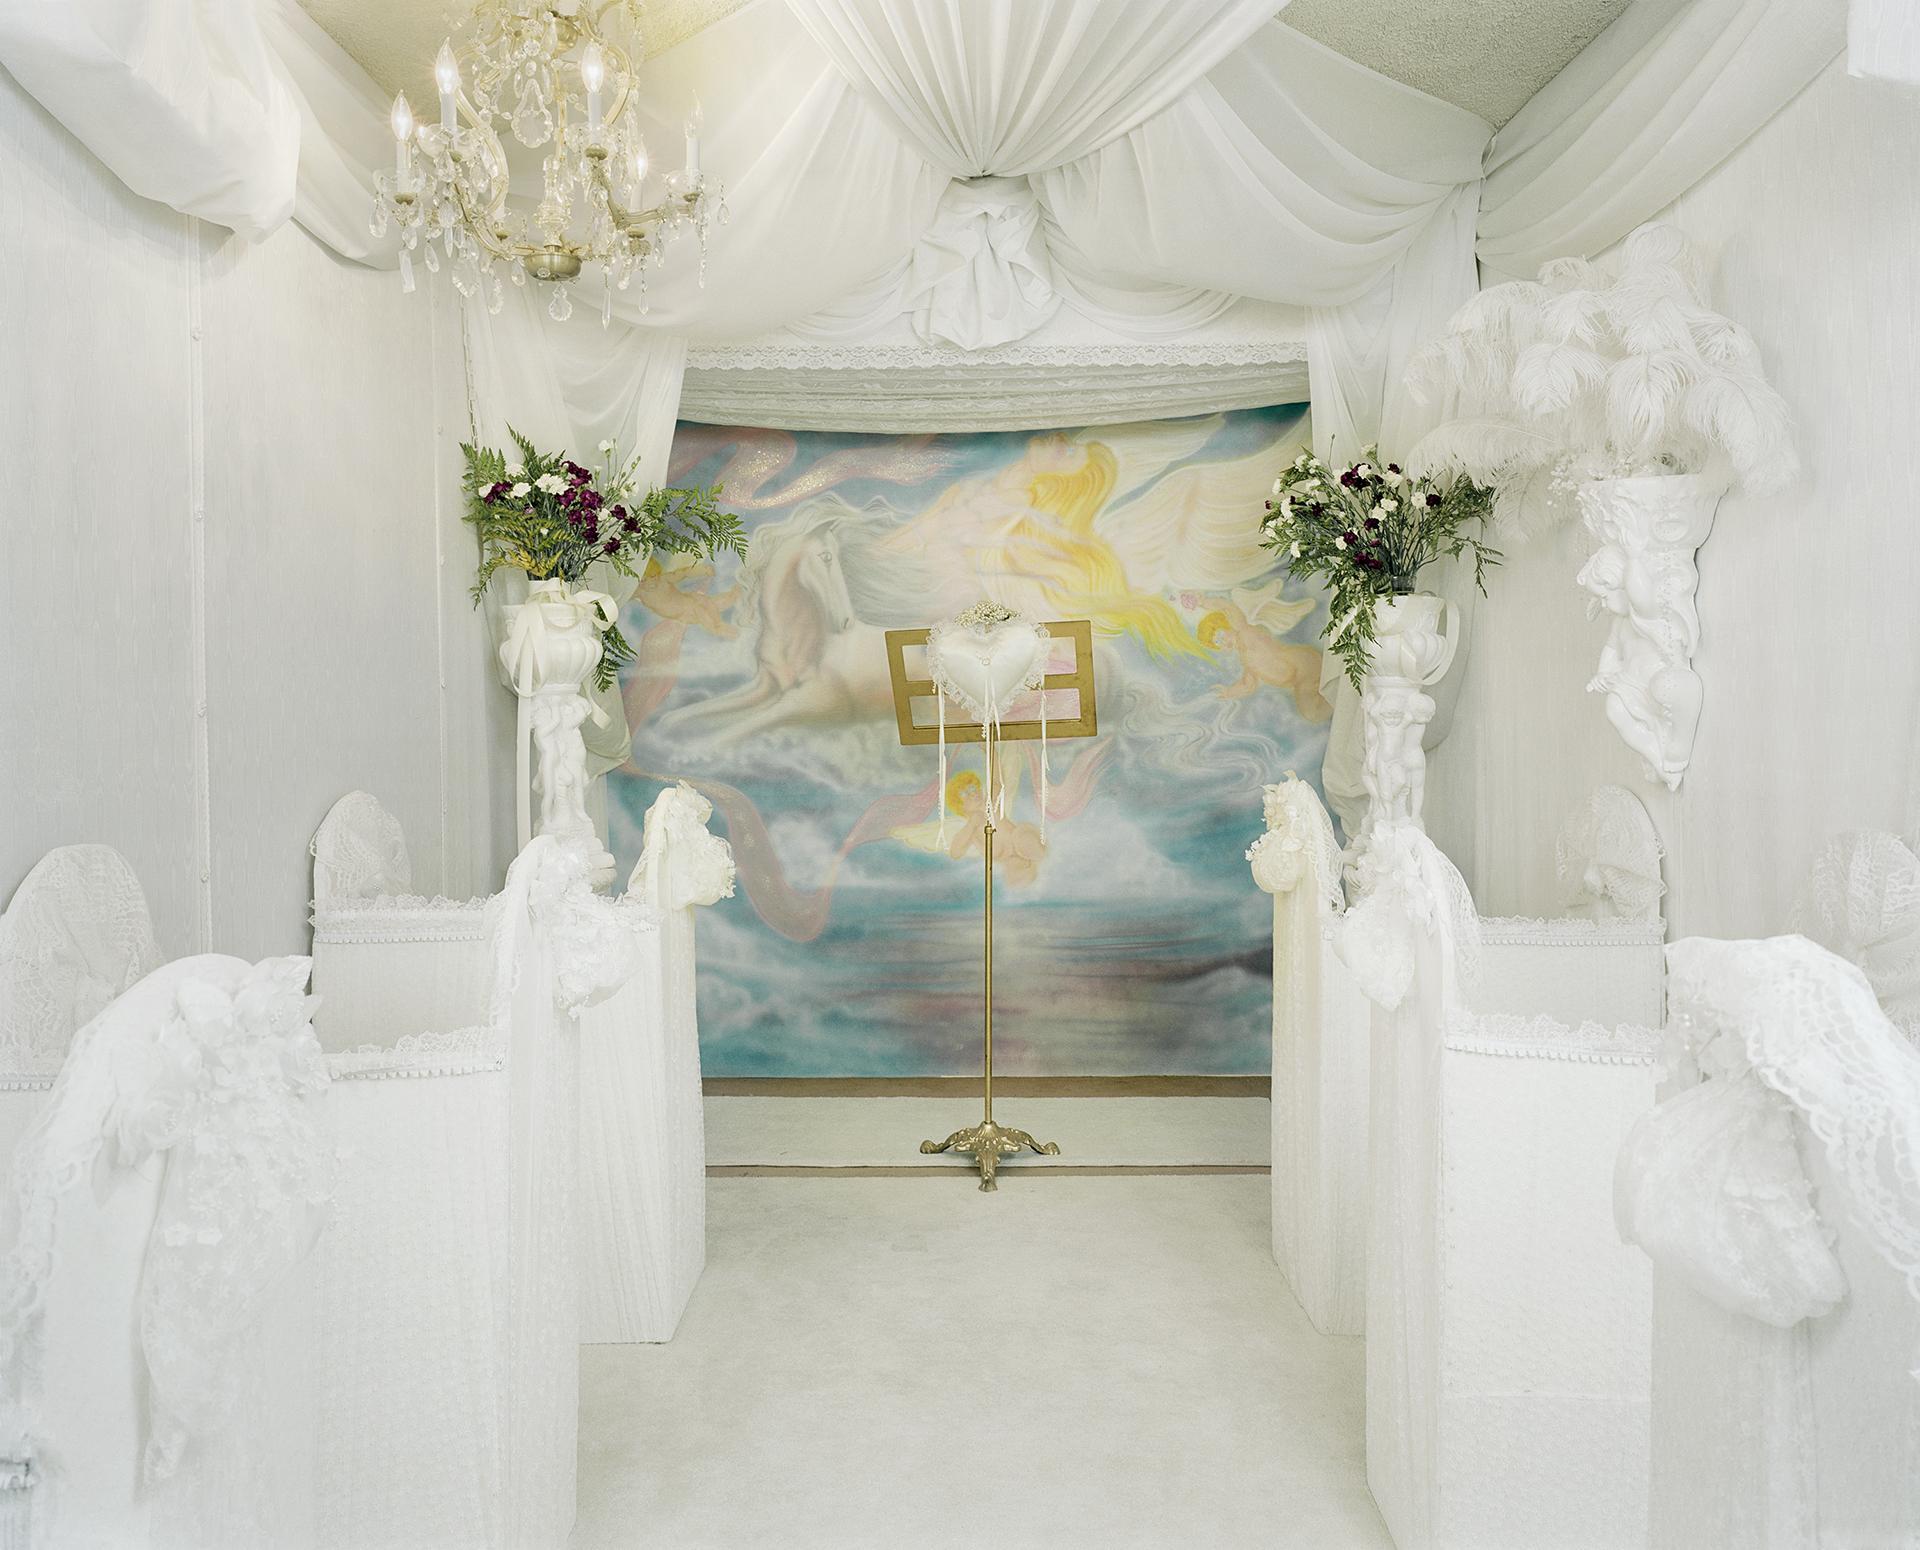 The Angel Chapel by Jane Hilton